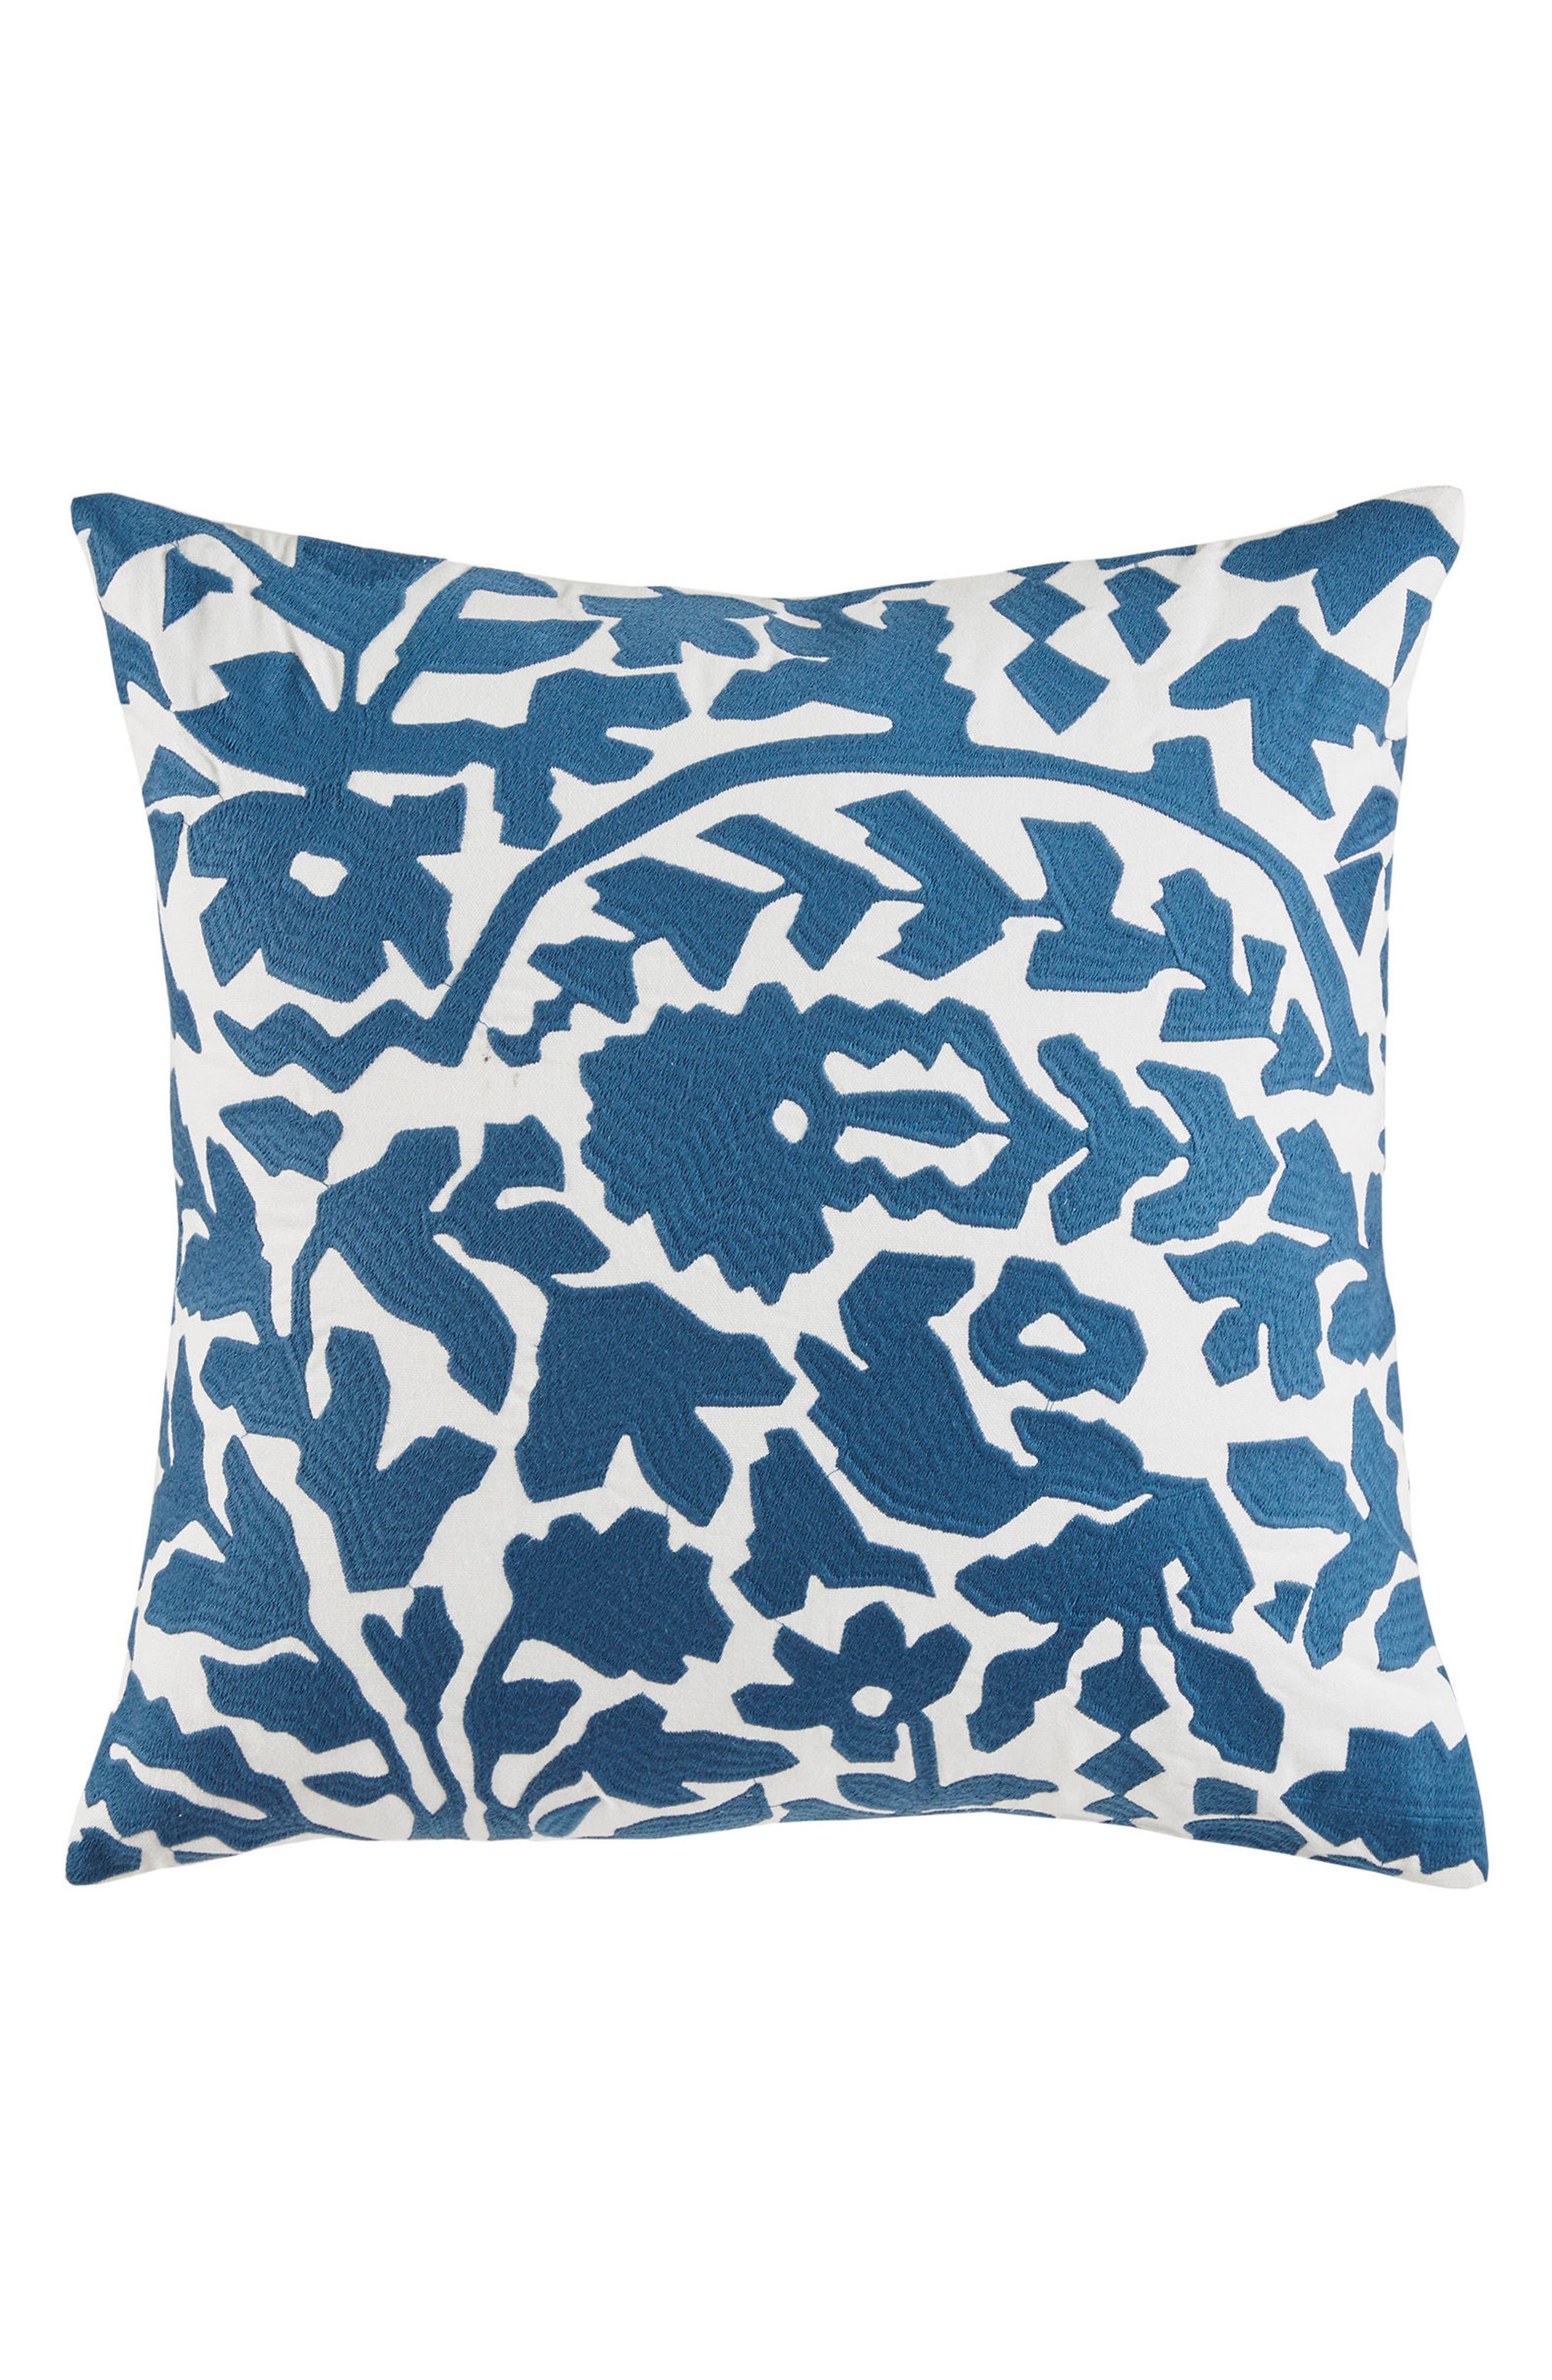 Oaxaca Floral Accent Pillow,                         Main,                         color, Dark Blue